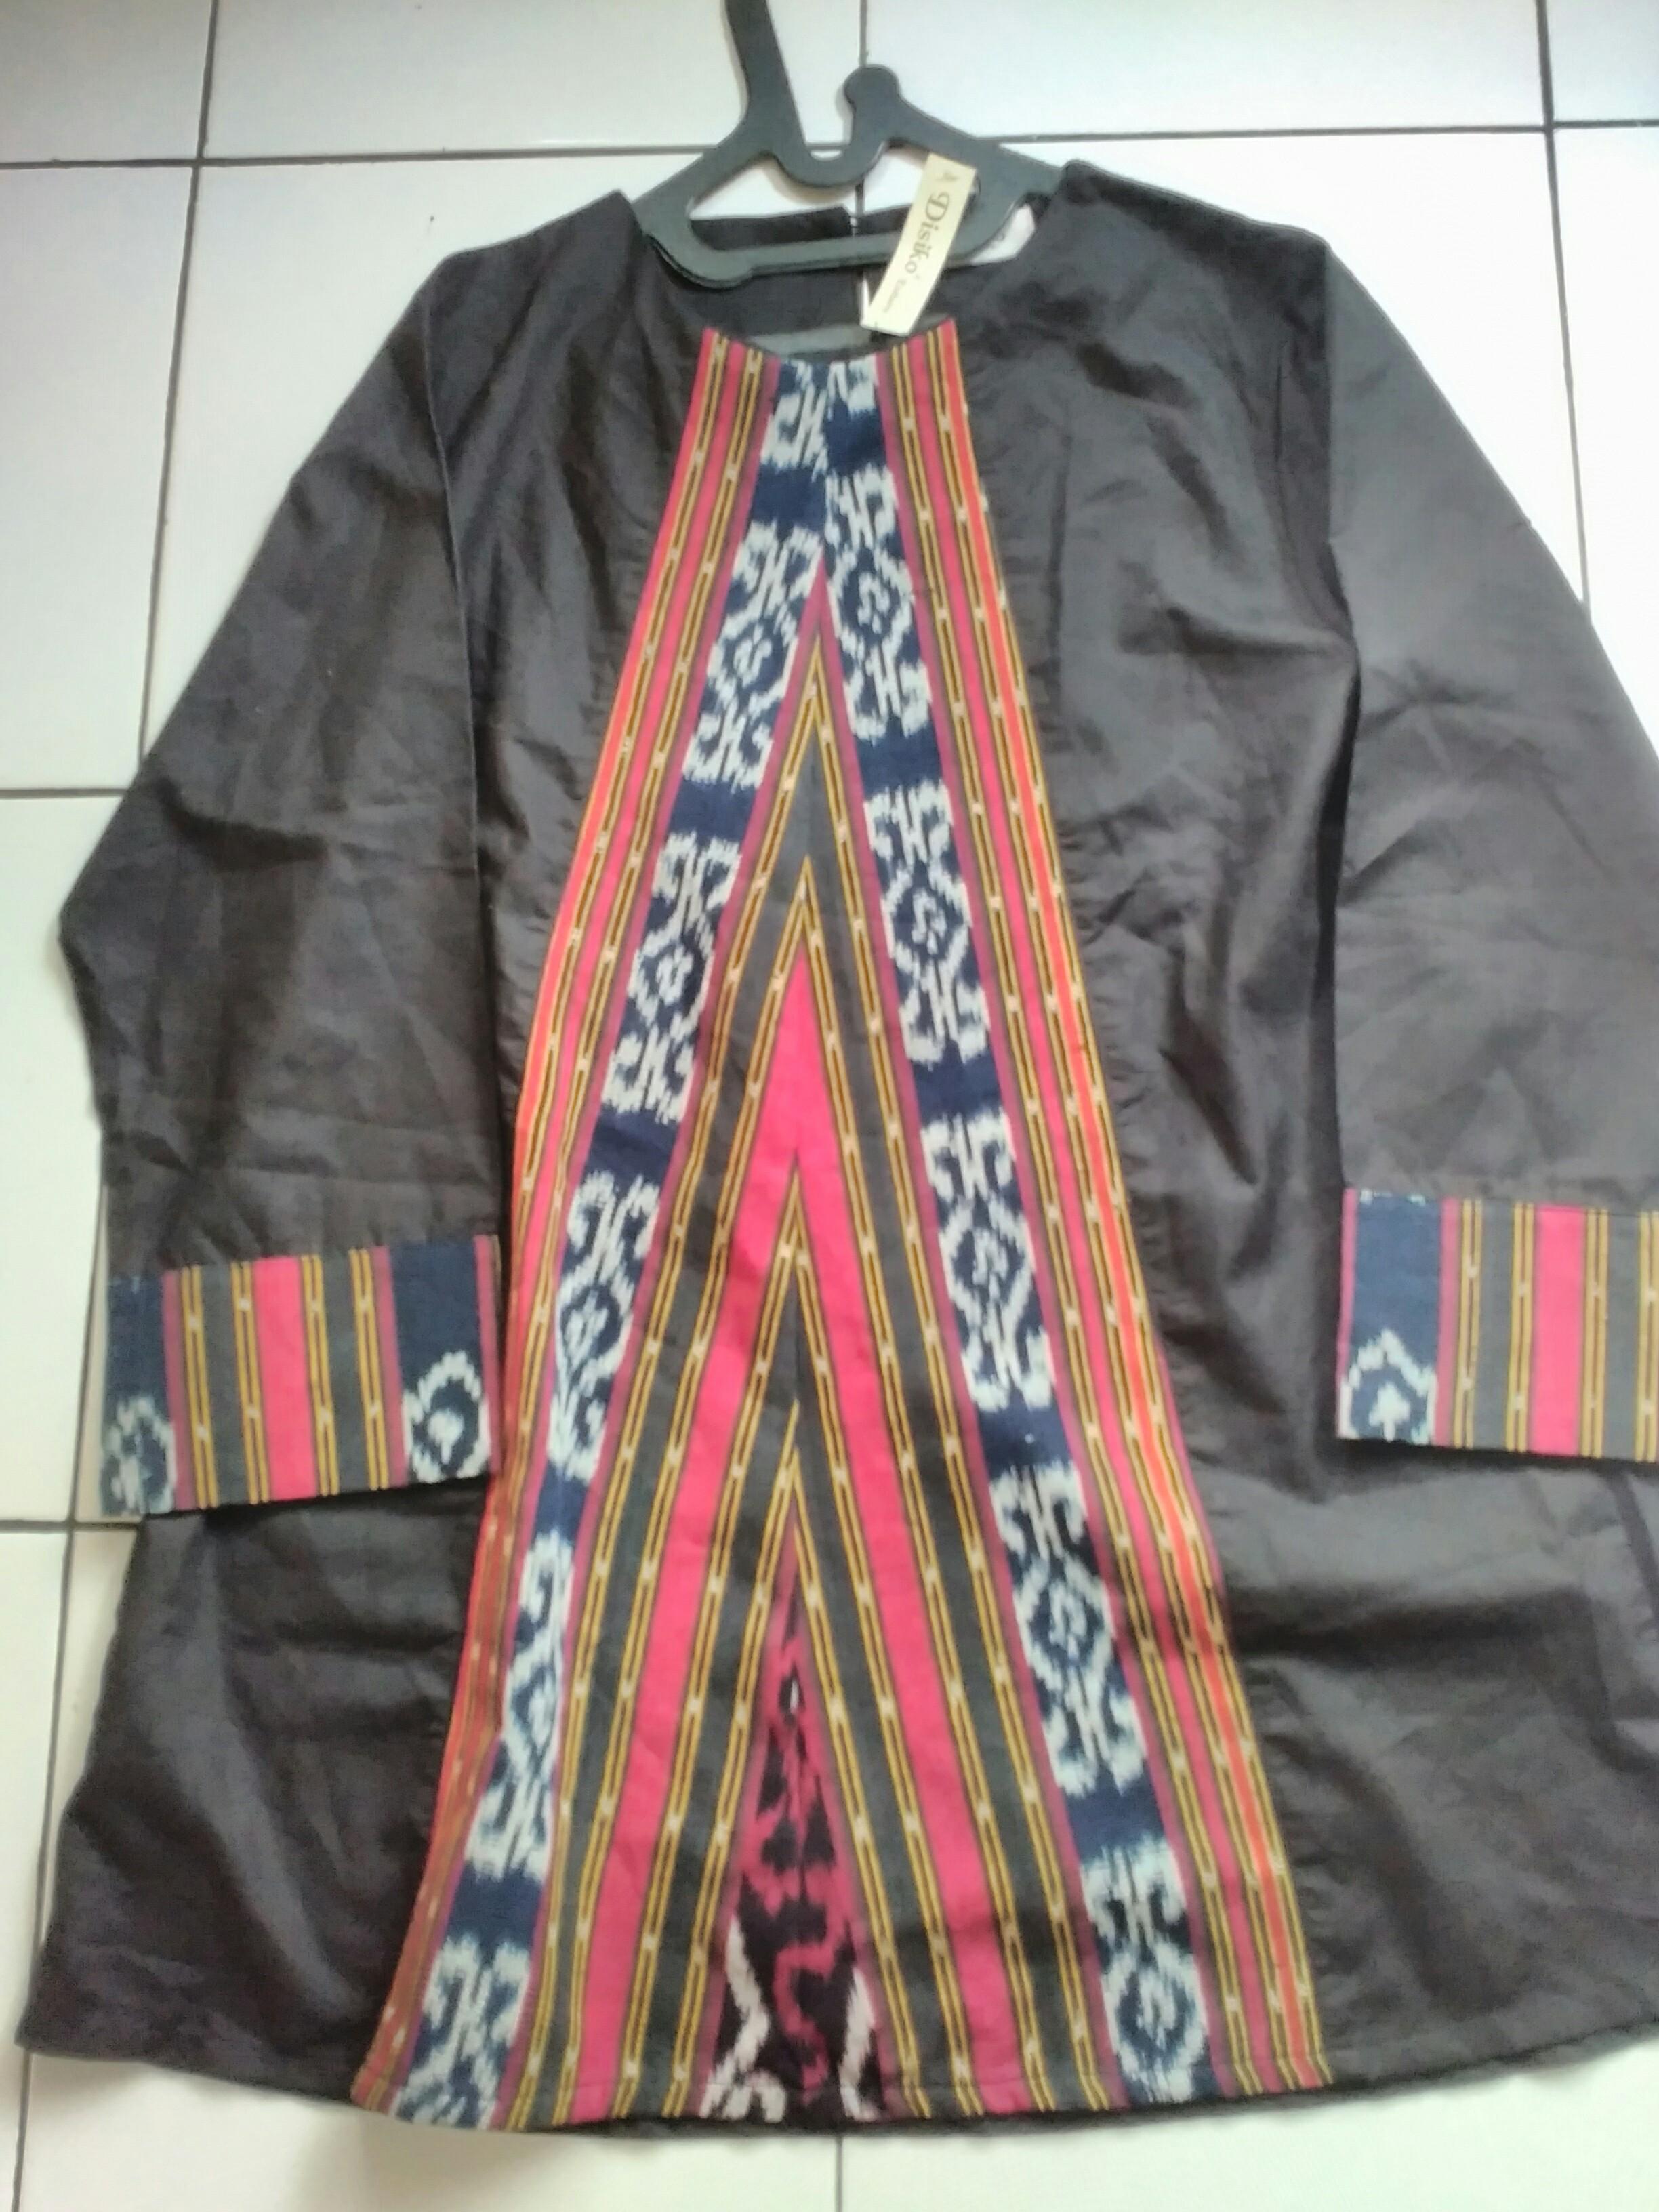 Harga Jual Etnik Tenun Bulu Terbaru 2018 Produk Ukm Bumn Set Dress Rajut Ungu Katun Ima Disiko Size L Newadem Olshop Fashion Bagikan Barang Ini